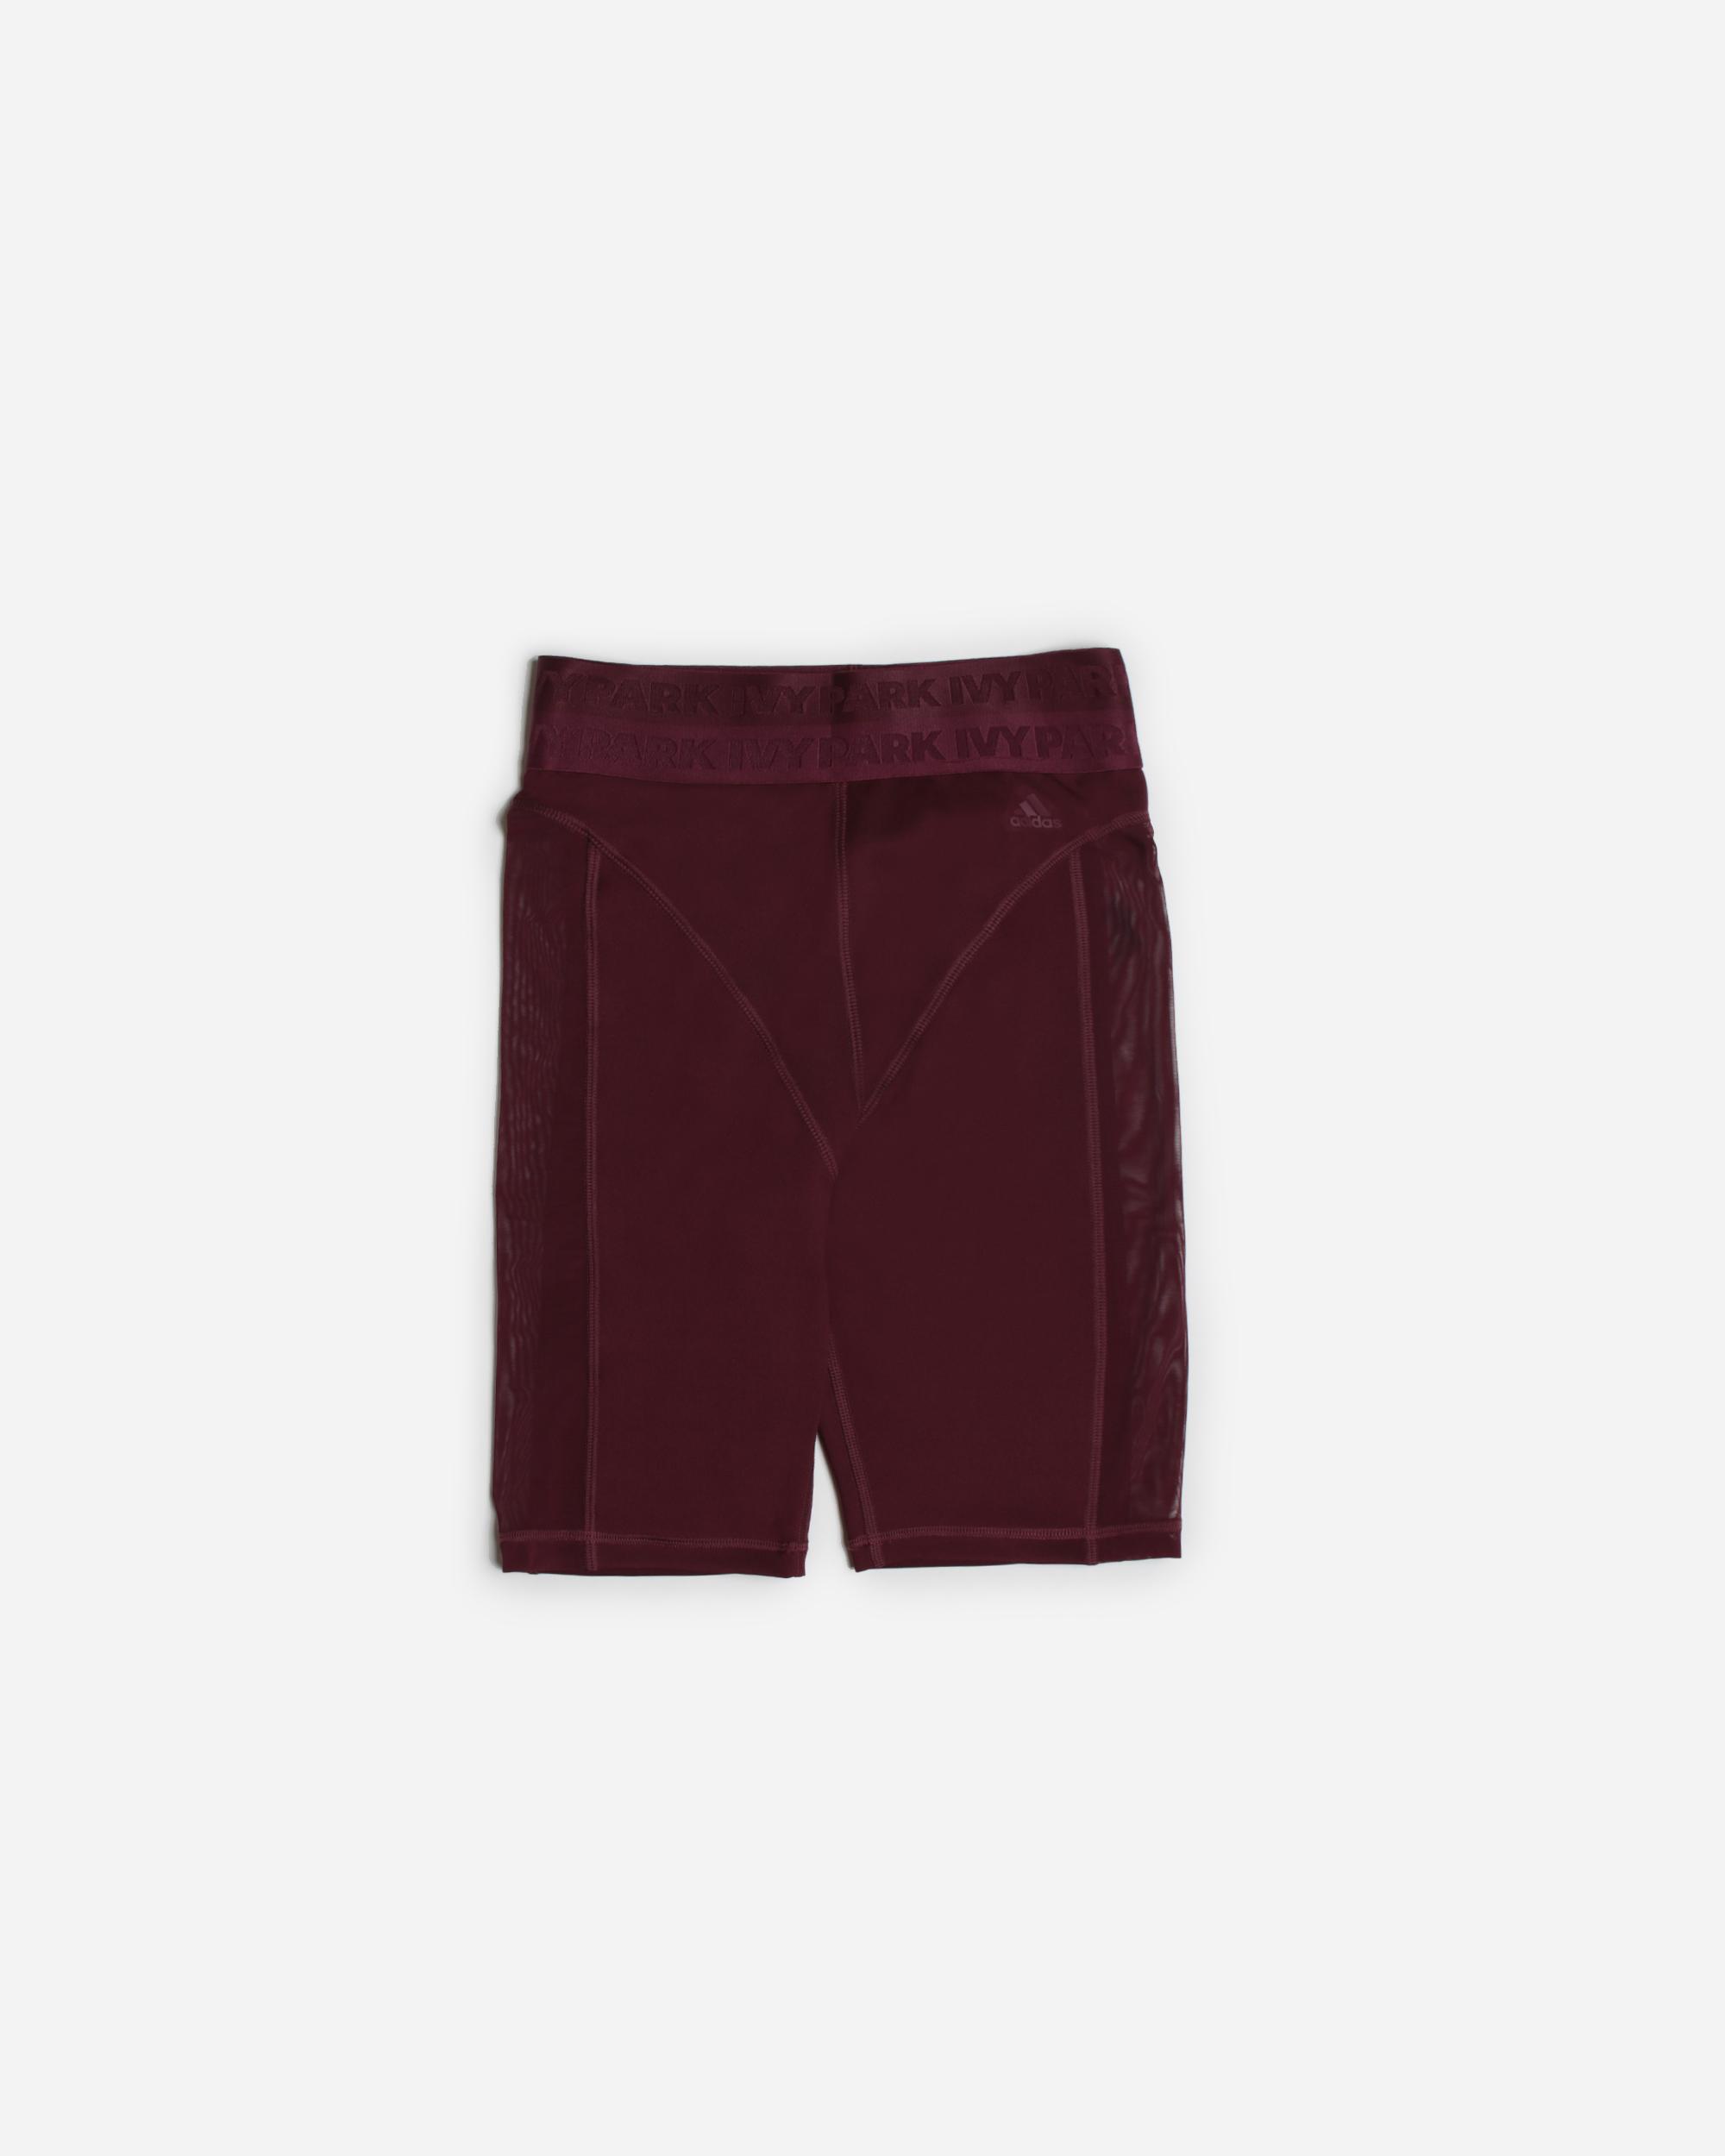 ivy park x adidas shorts